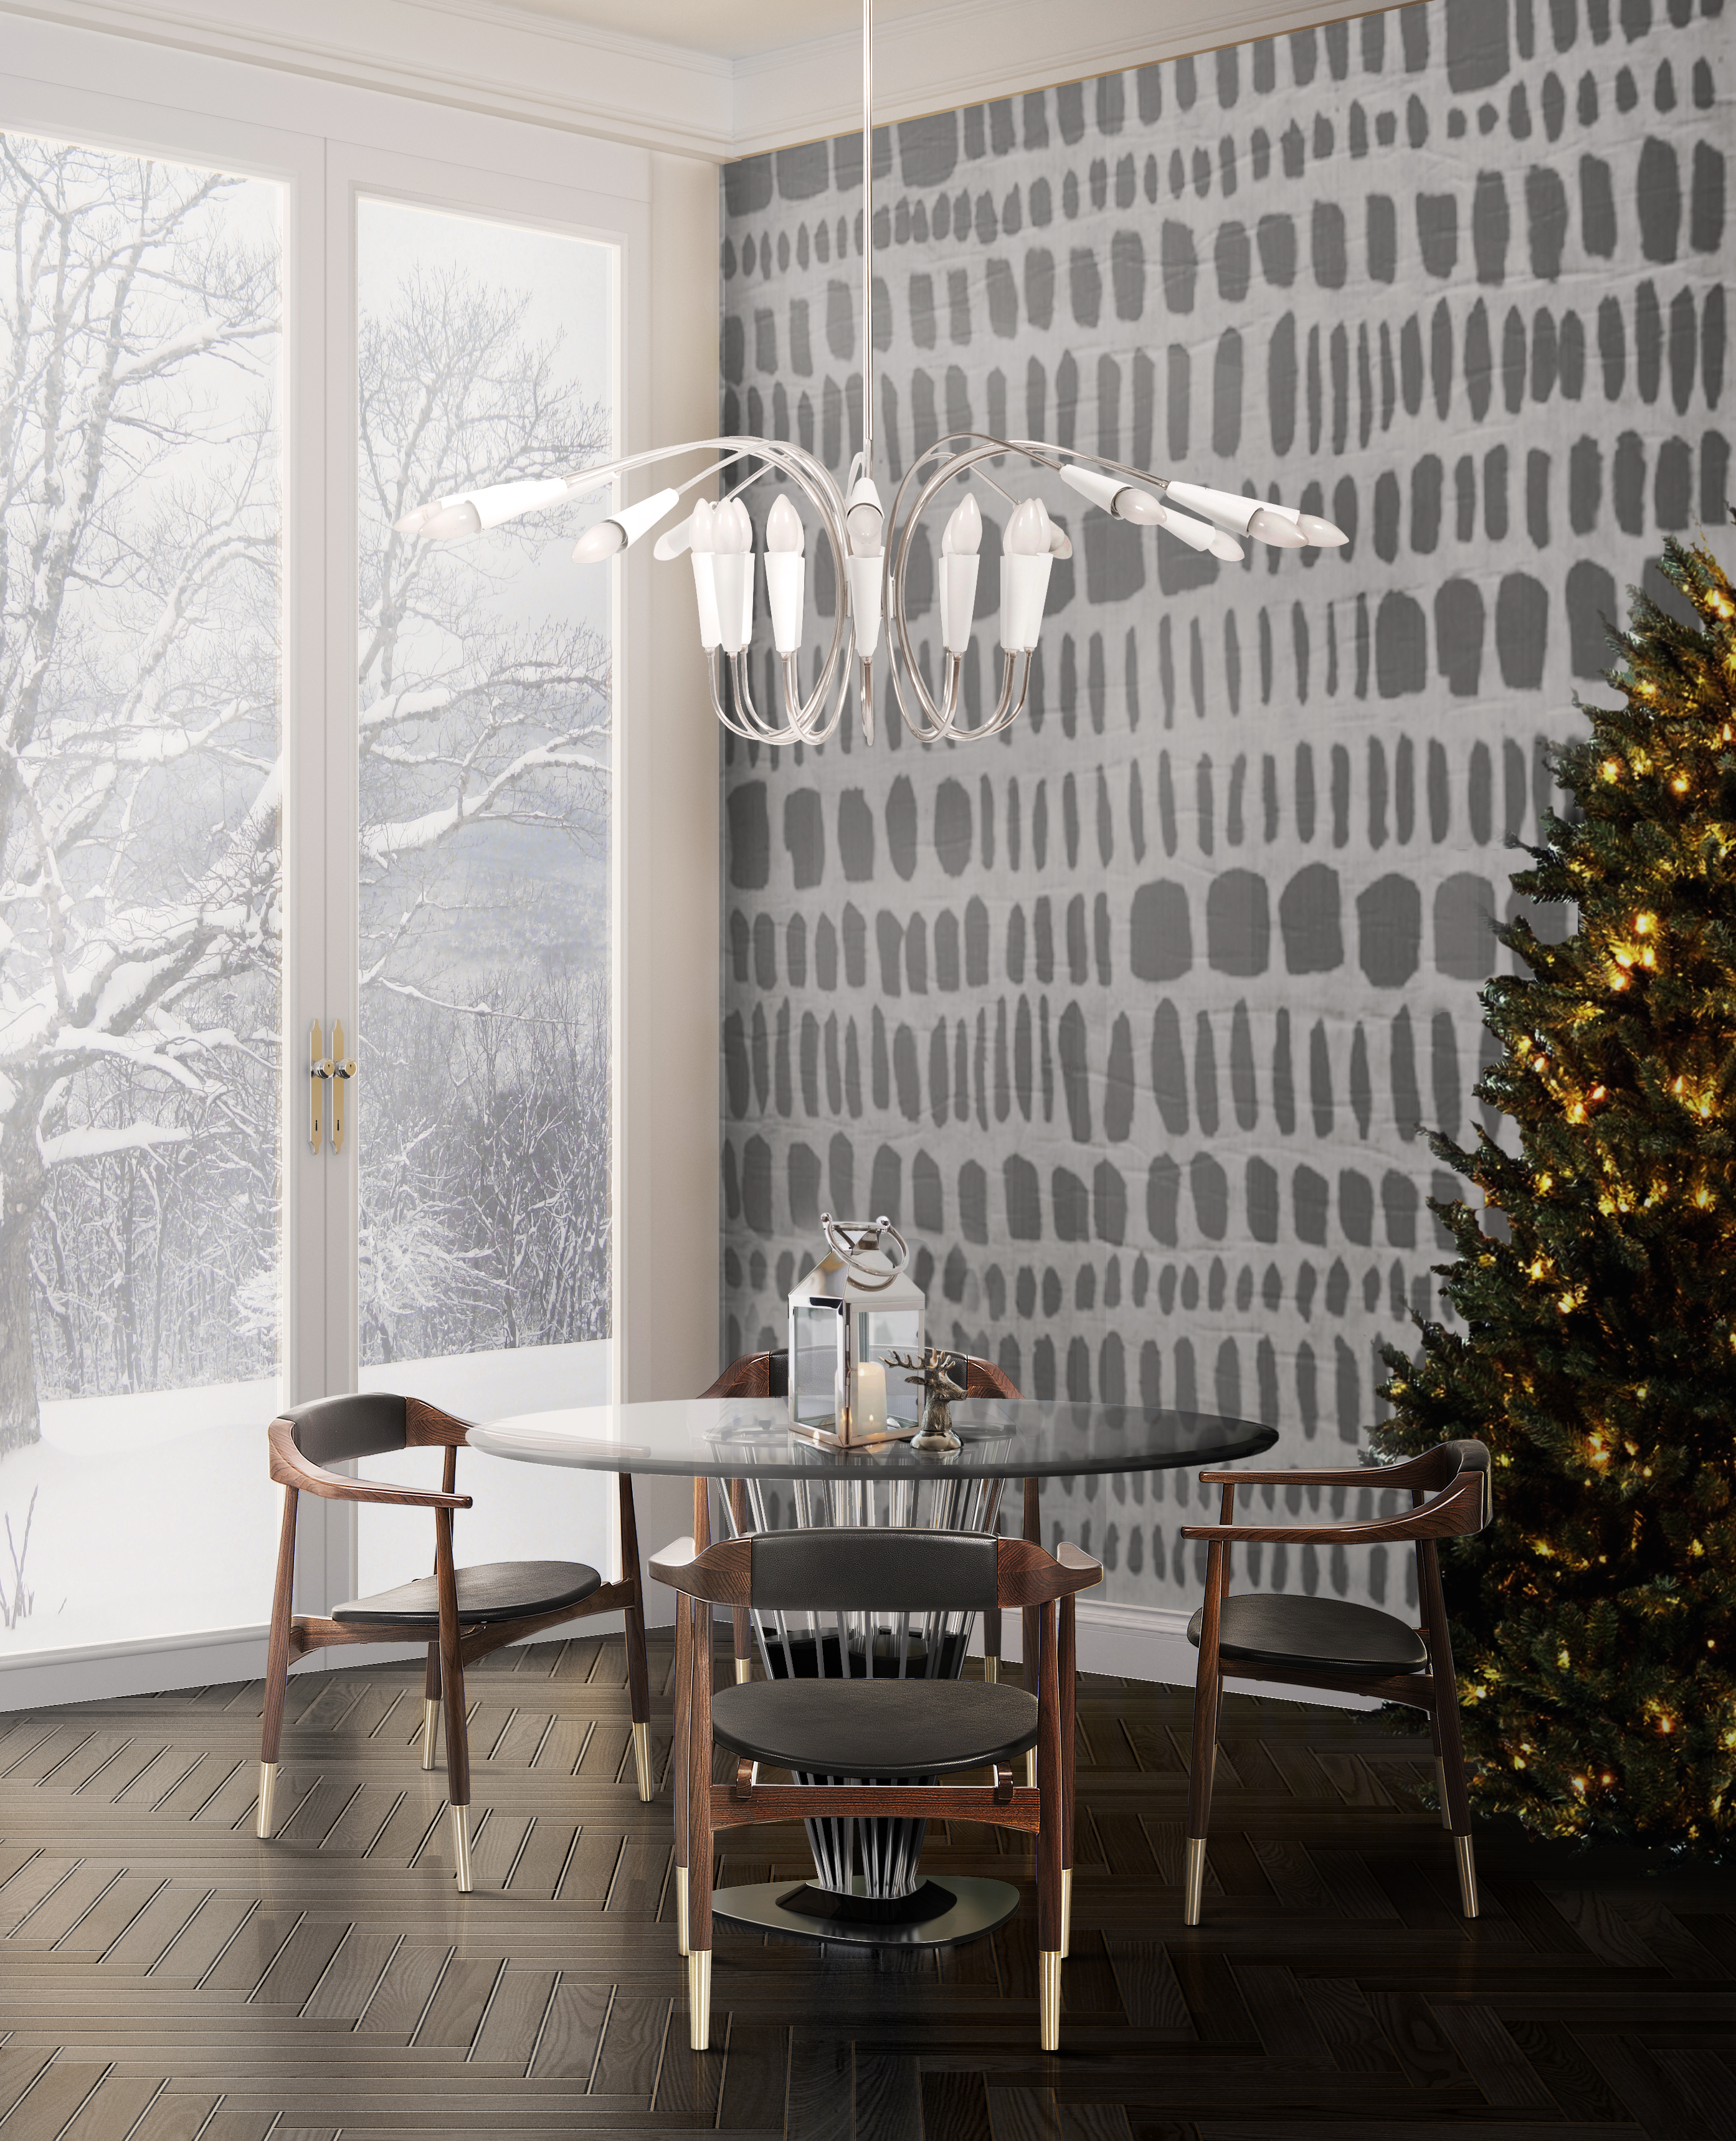 Top 7 Candeeiros Para Obter A Melhor Iluminação De Natal Em Sua Casa iluminação de Natal